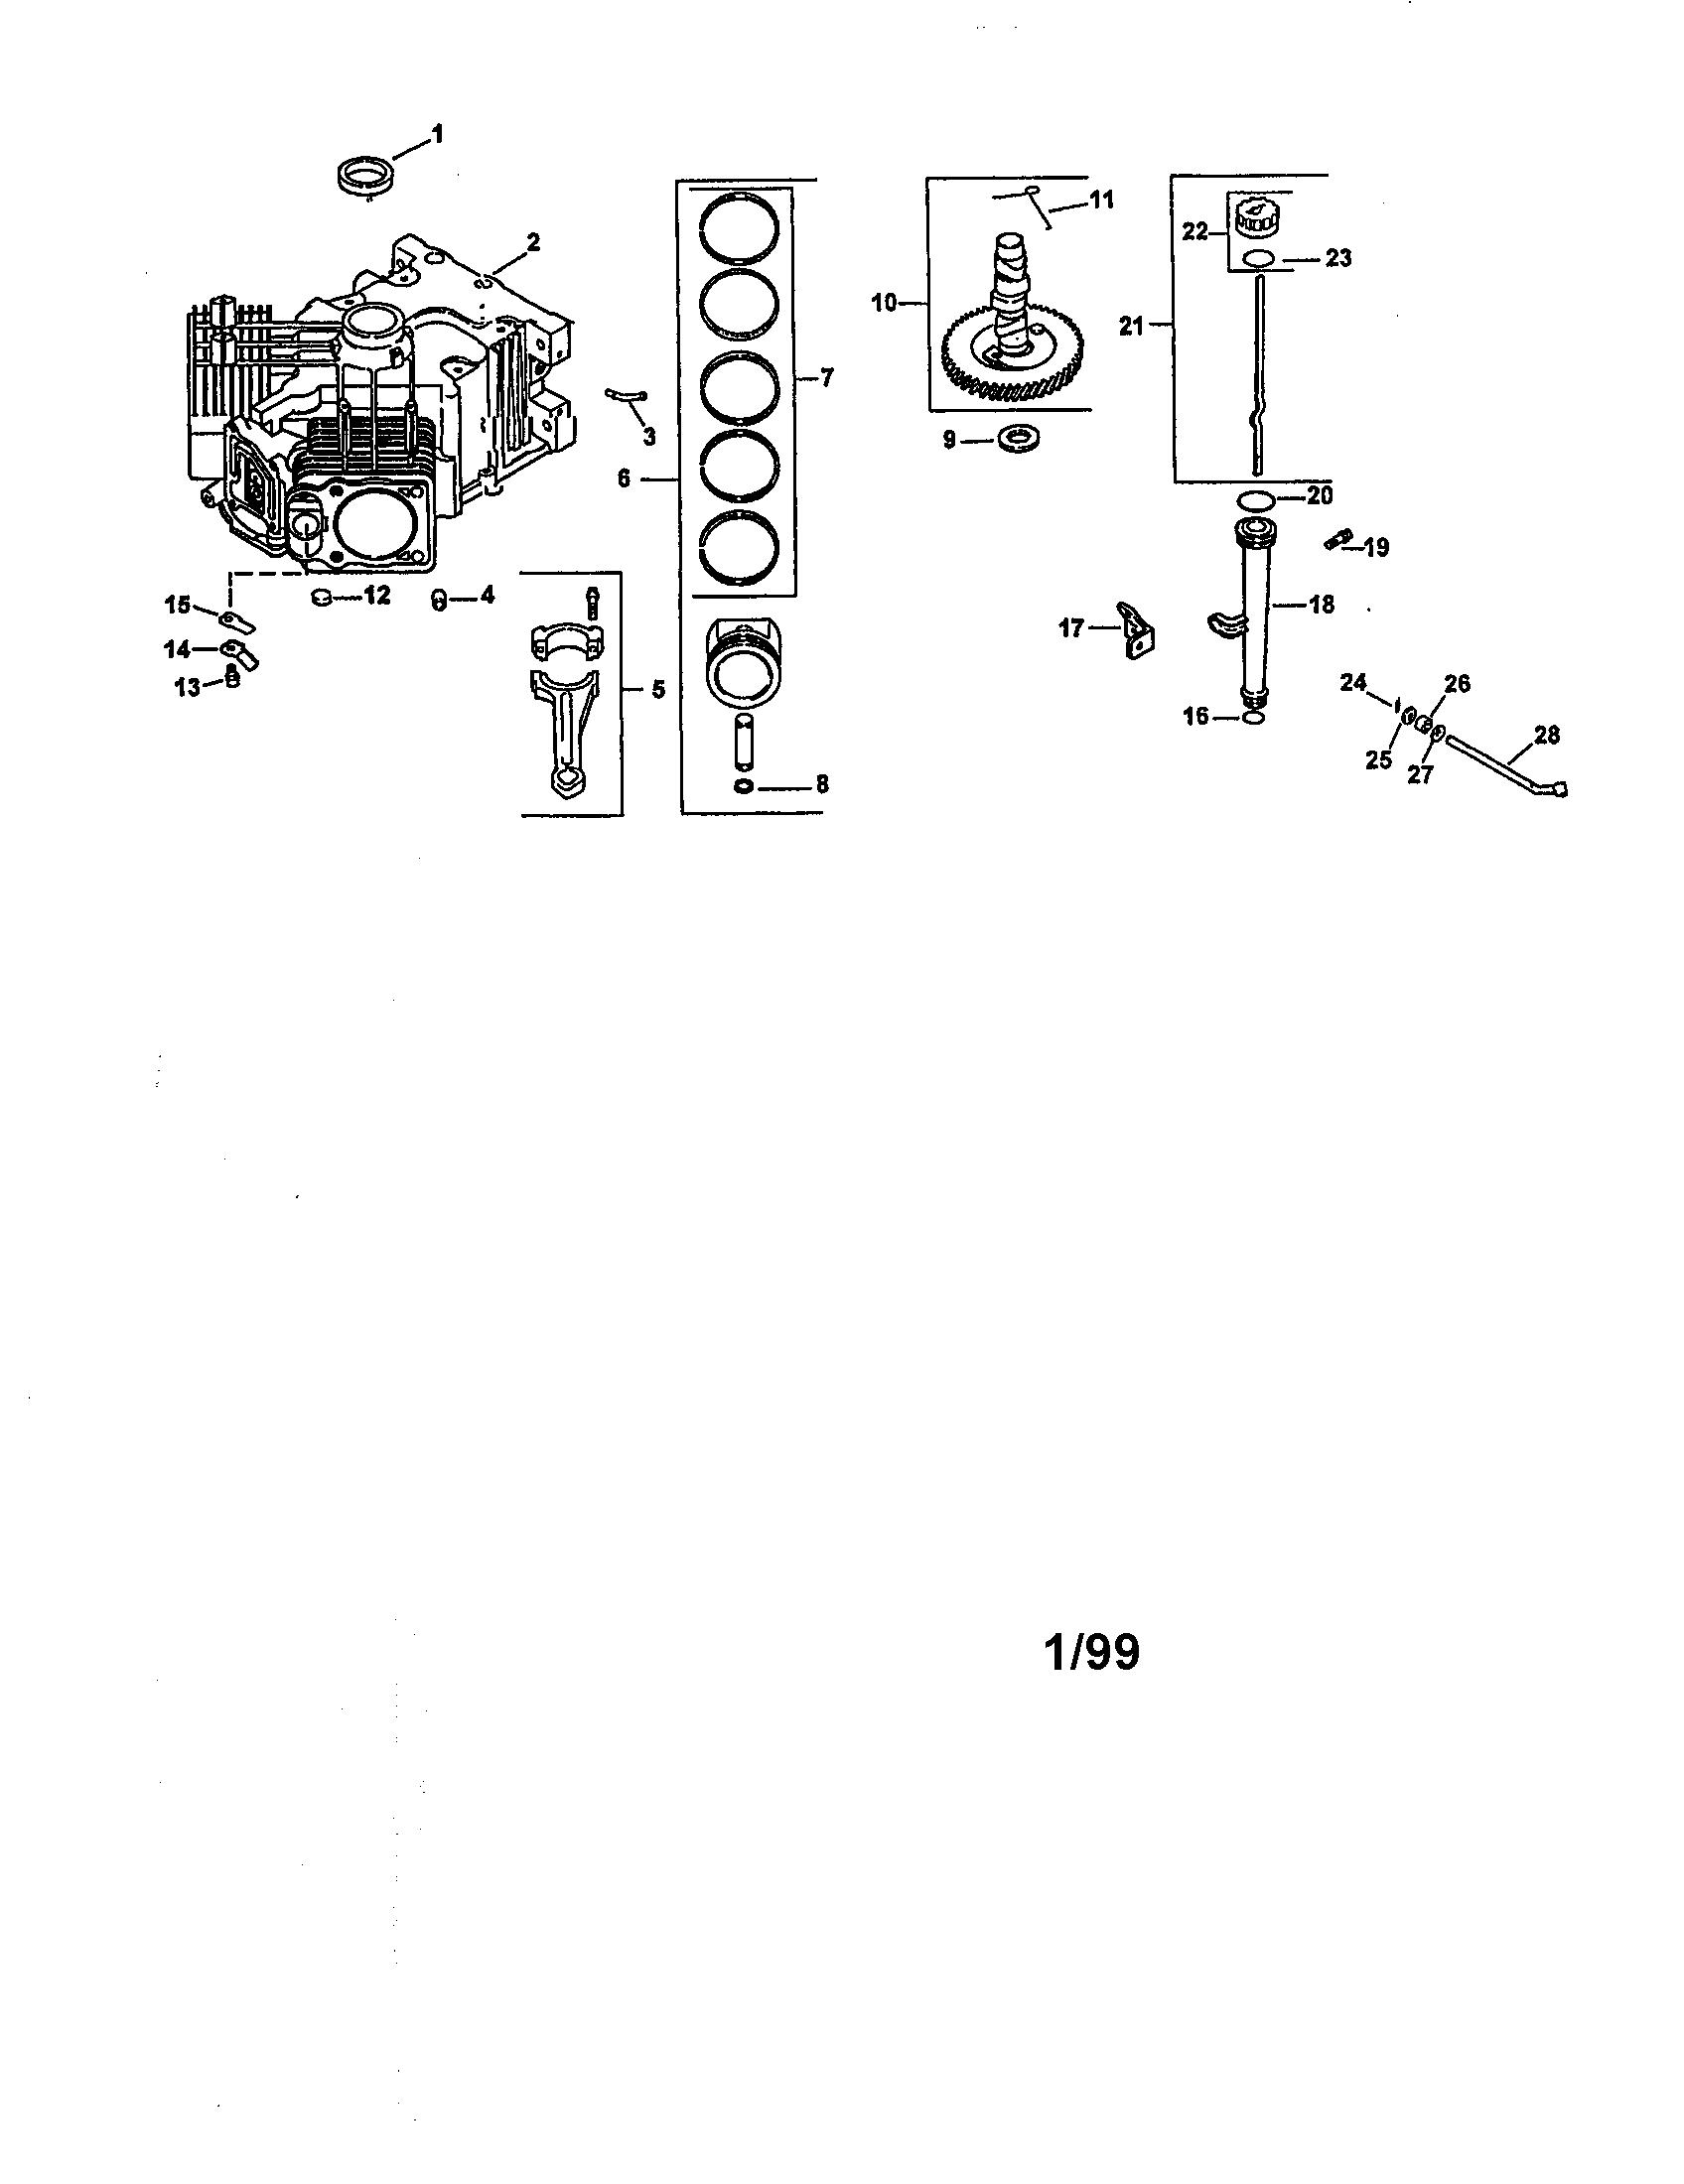 kohler engine parts model cv20s65551 sears partsdirect crankcase